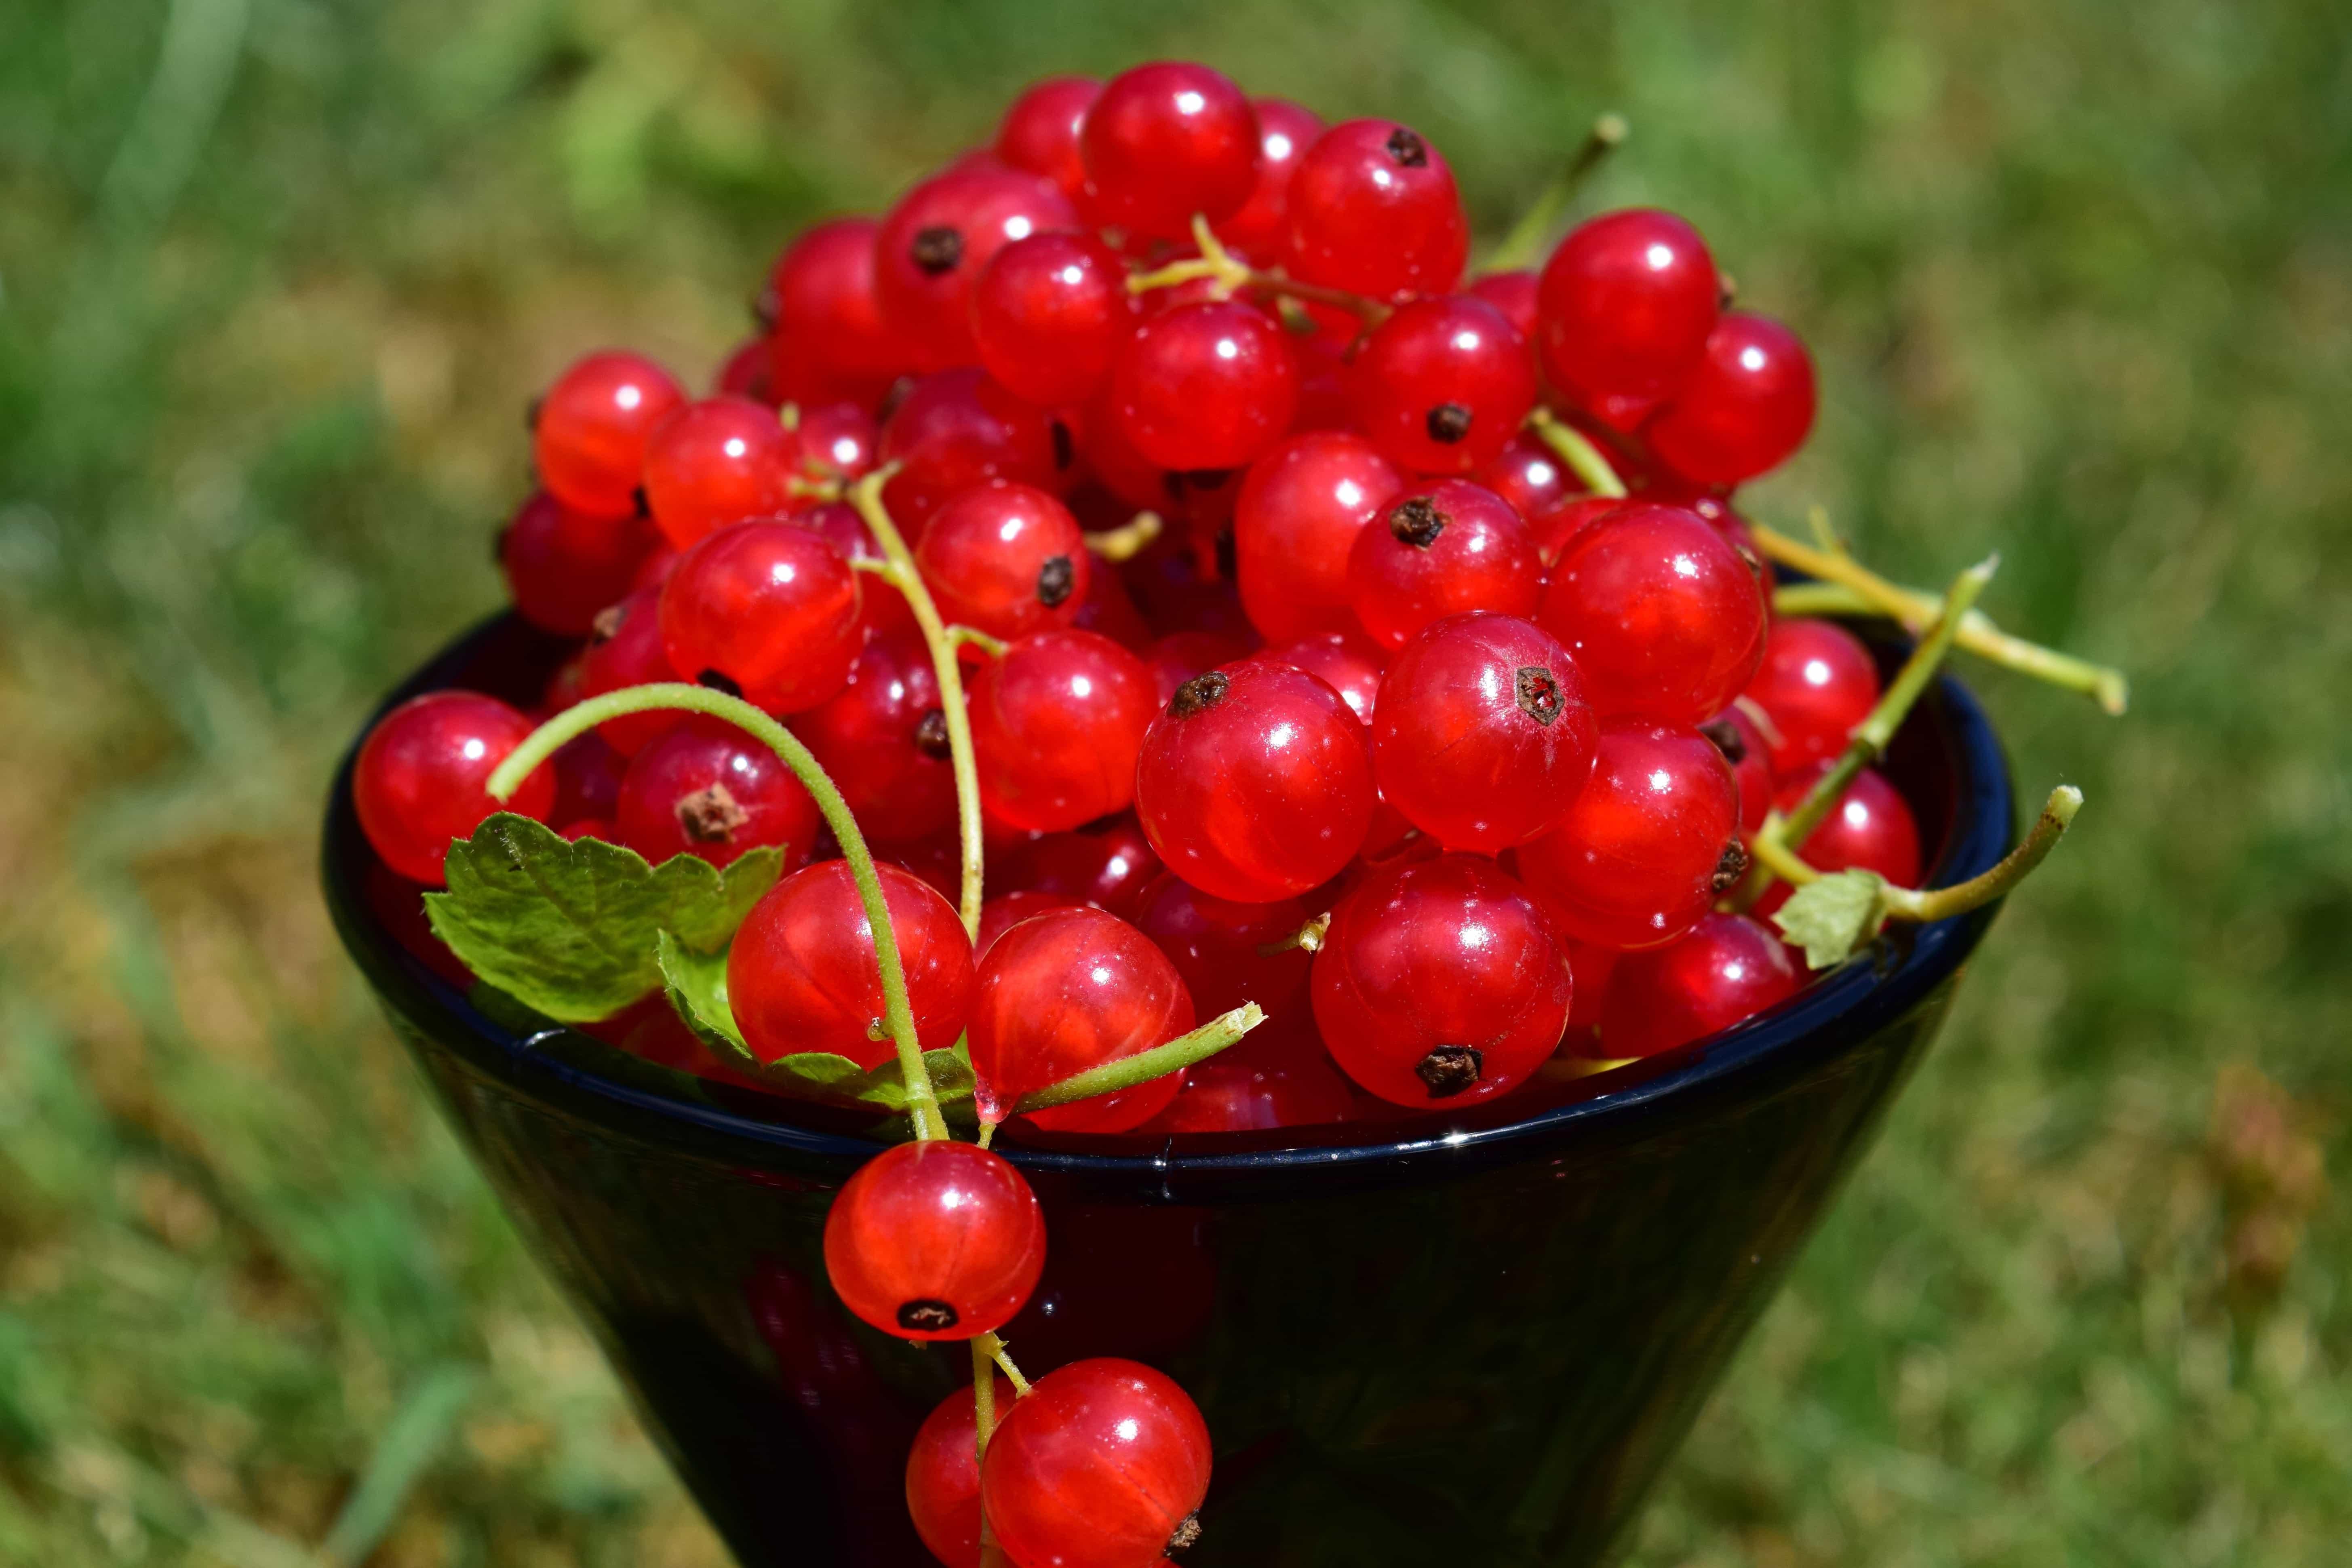 fruta, comida, hojas, jardín, baya, grosella, dulce